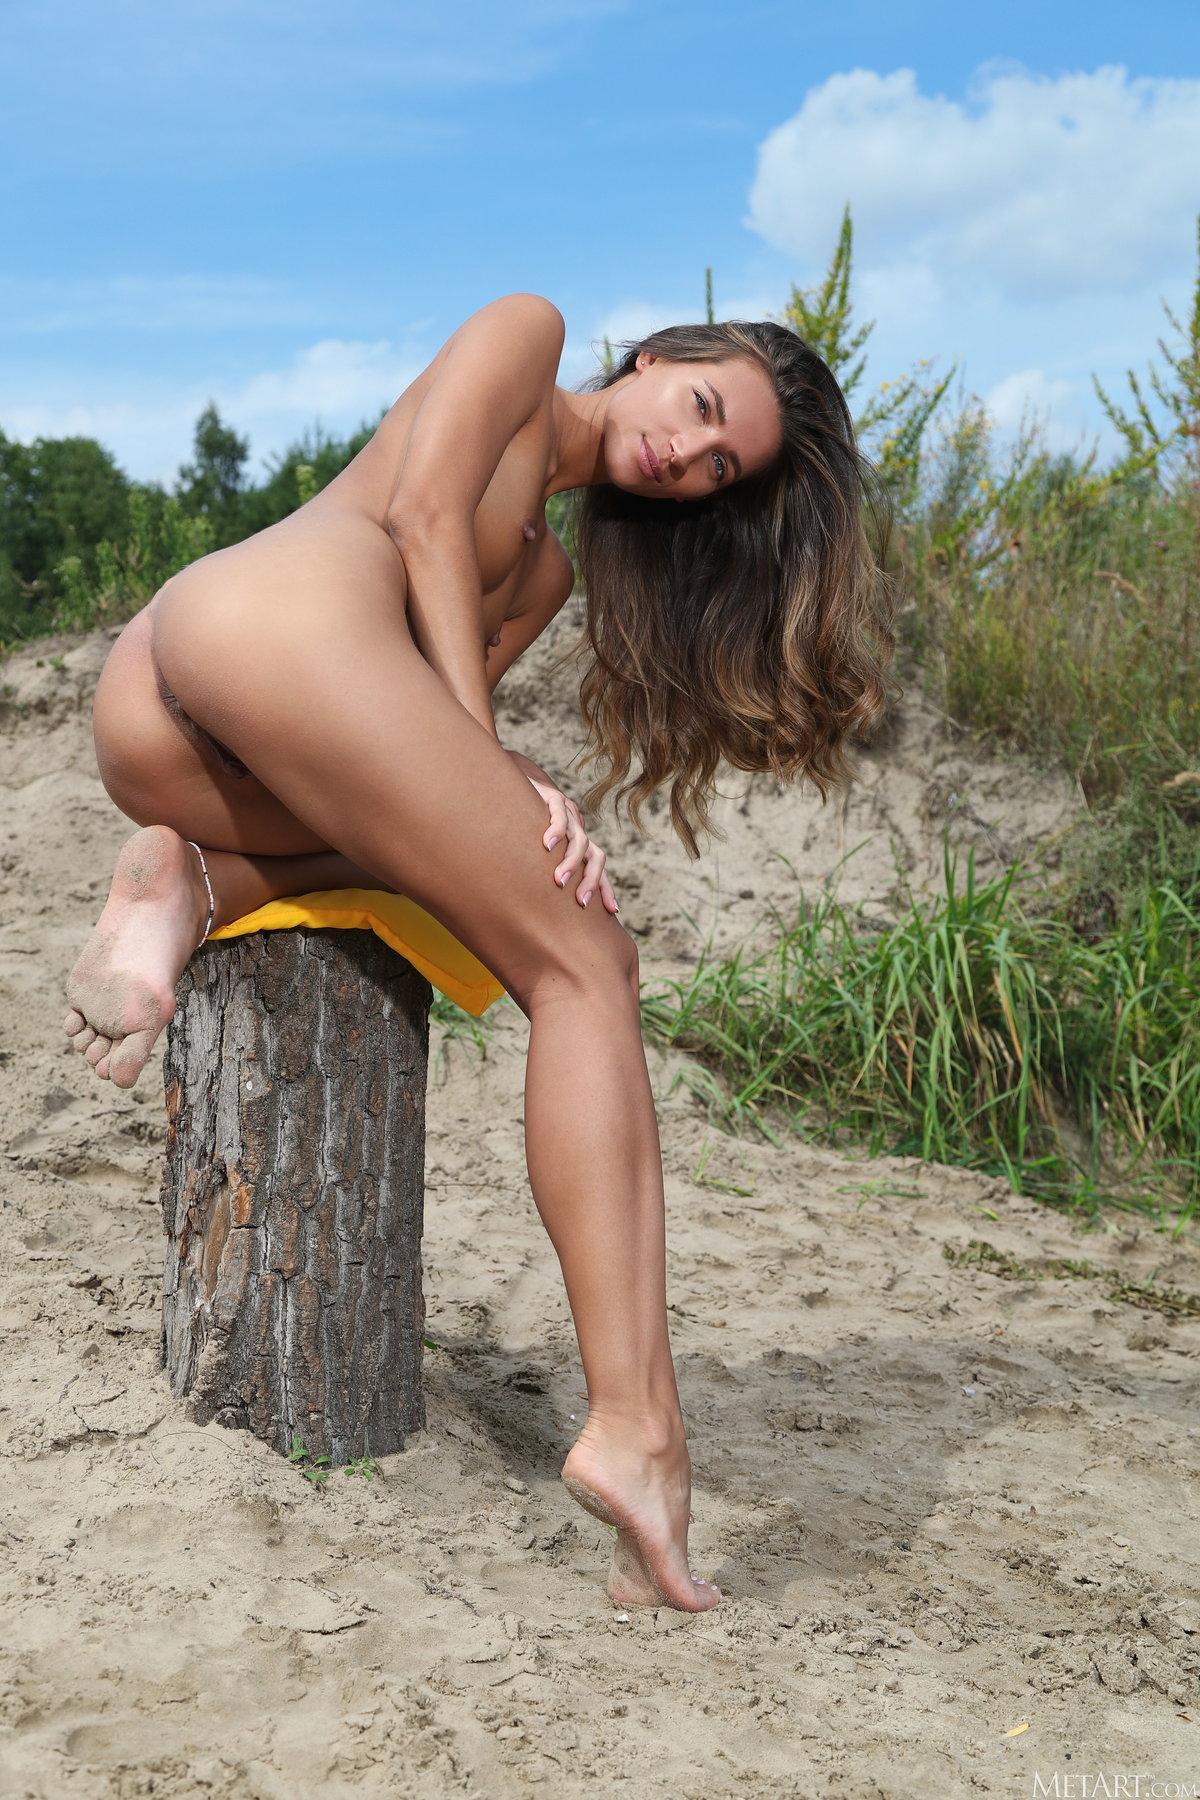 Kenya Trying Out BDSM 31